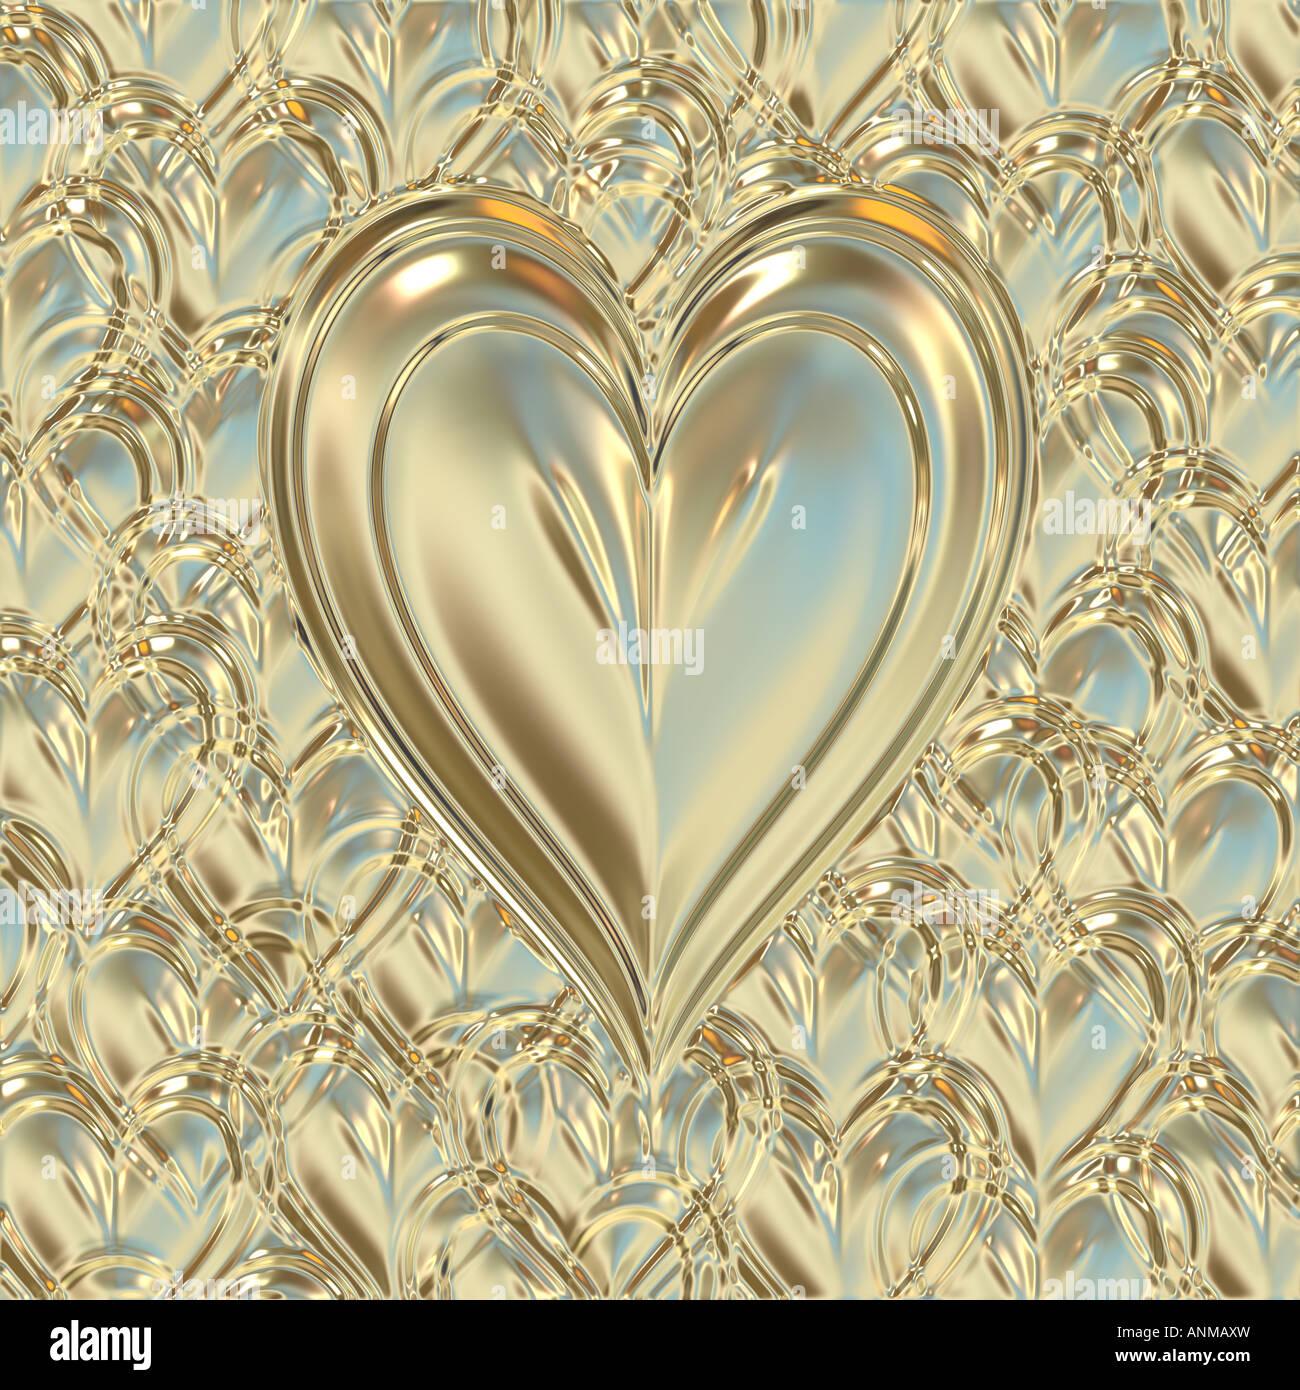 big bright beautiful golden metallic heart on golden background - Stock Image